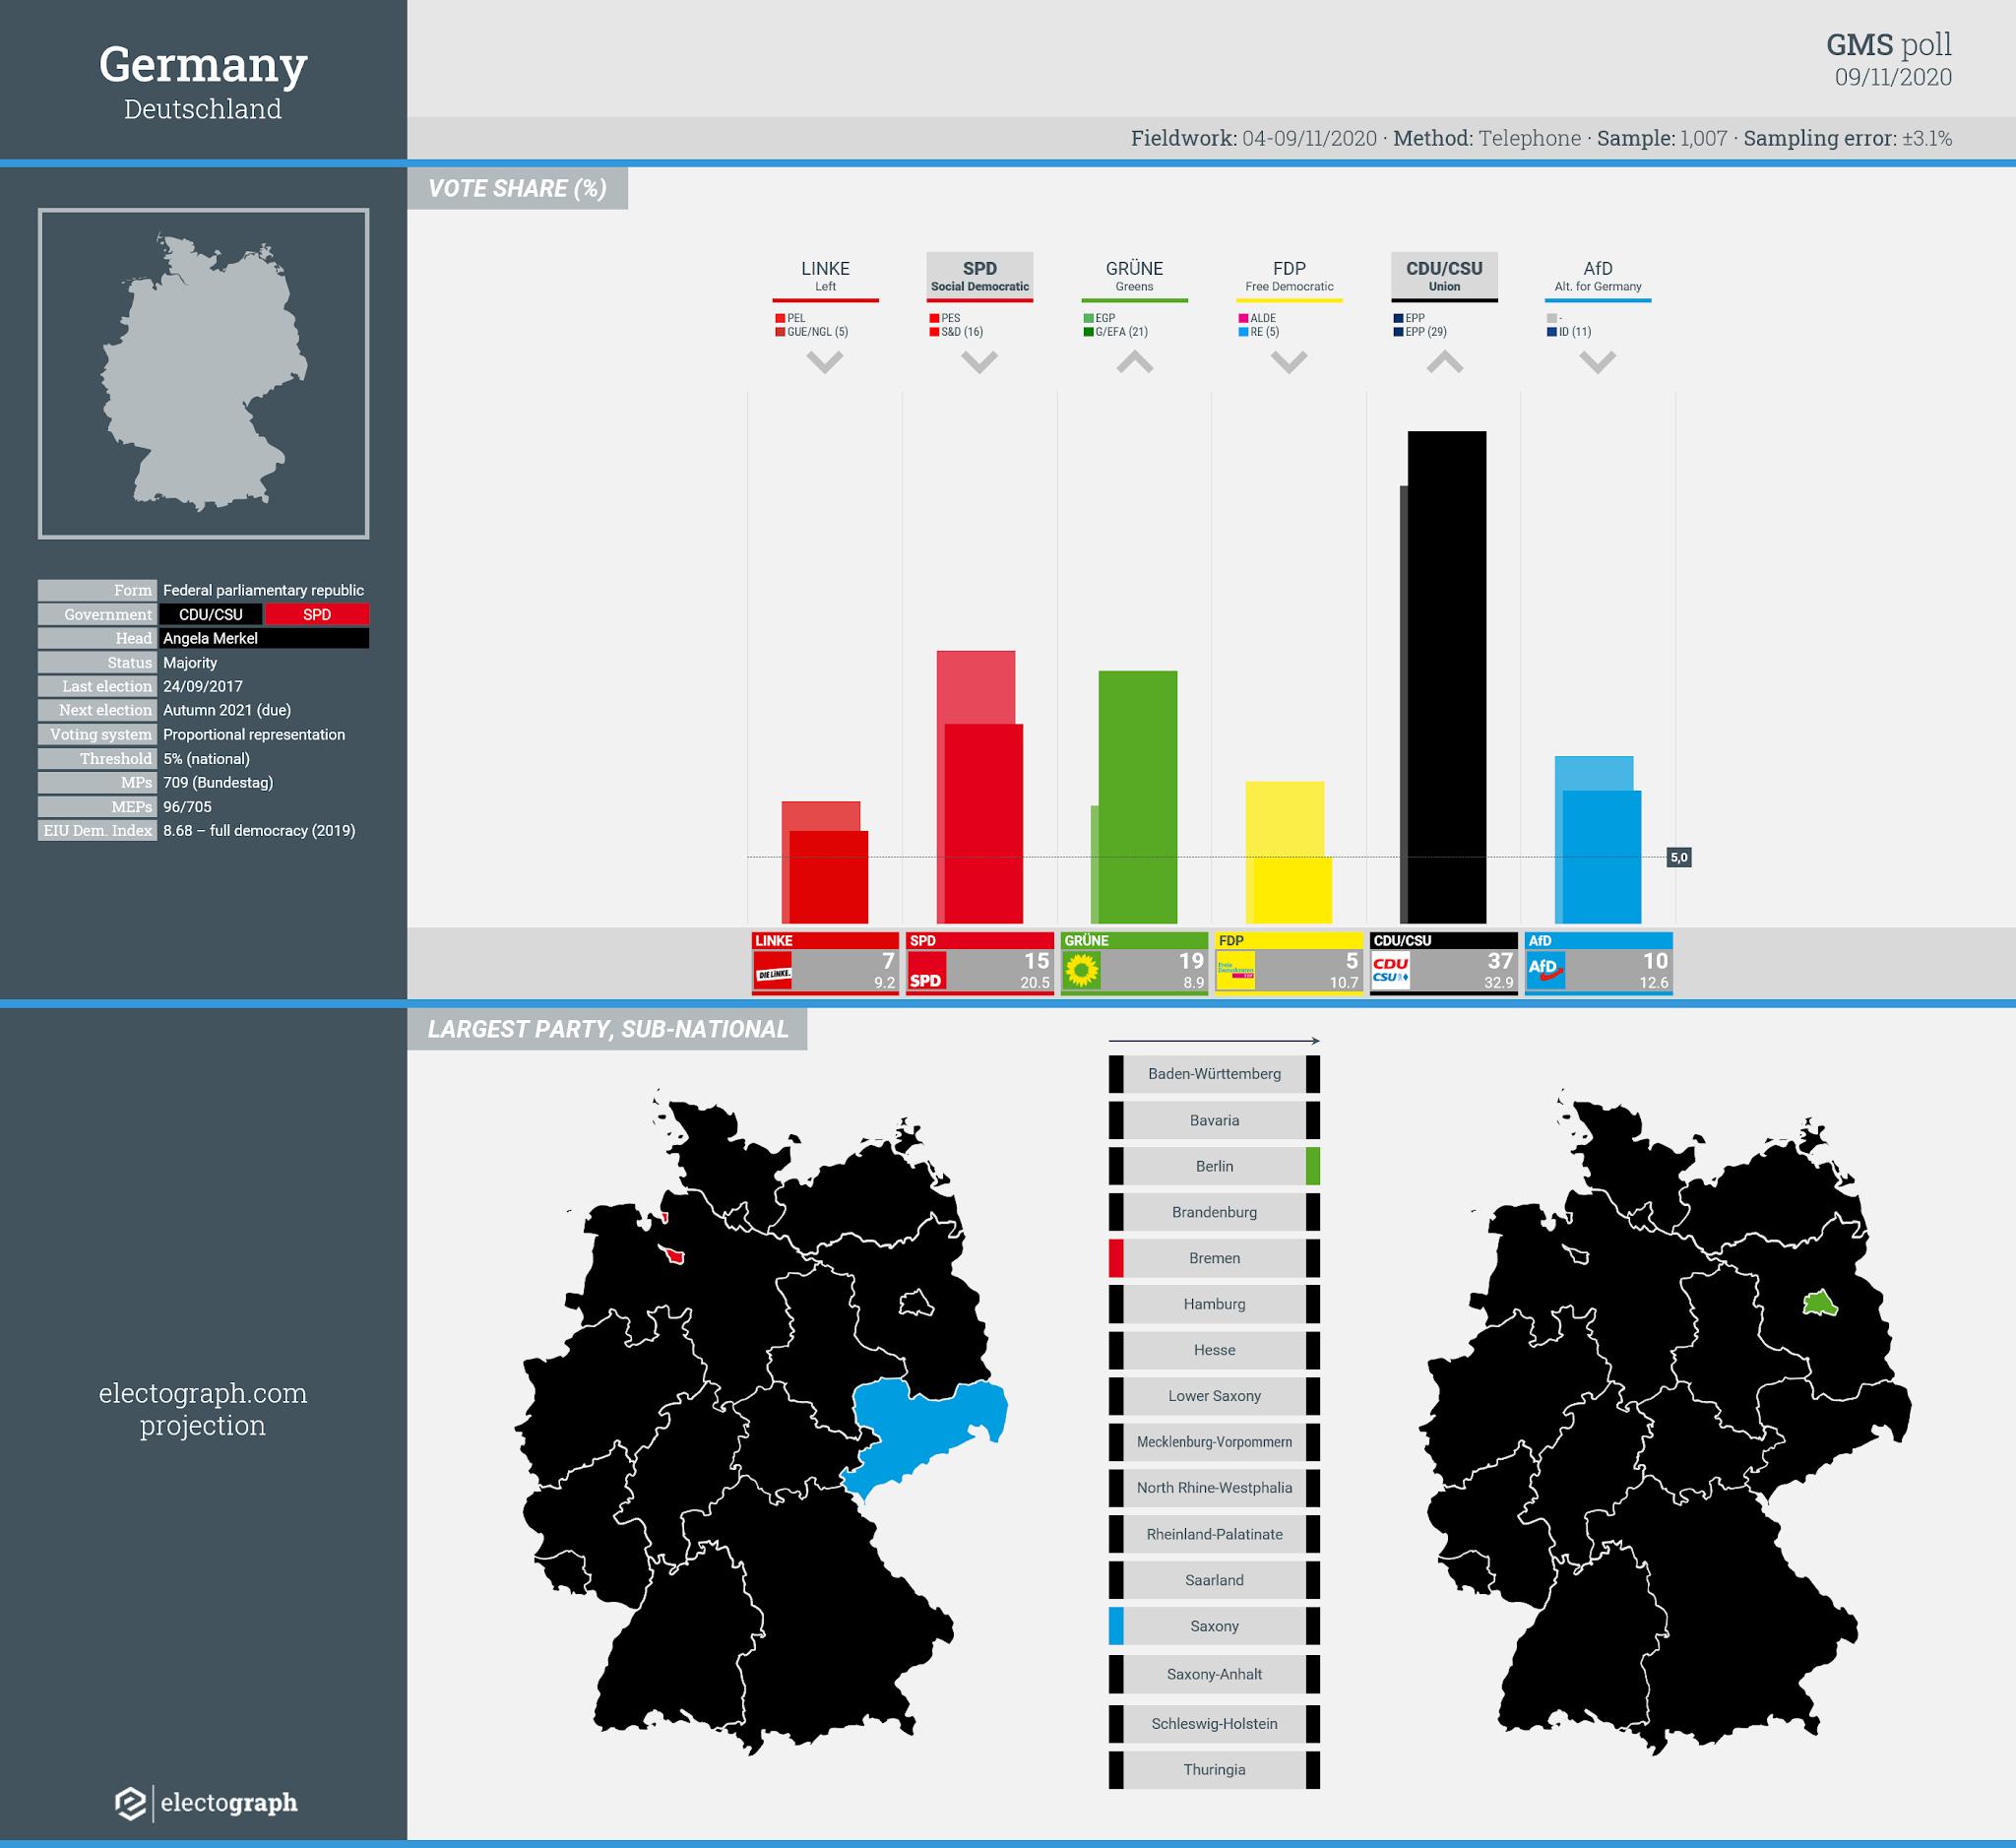 GERMANY: GMS poll chart, 9 November 2020